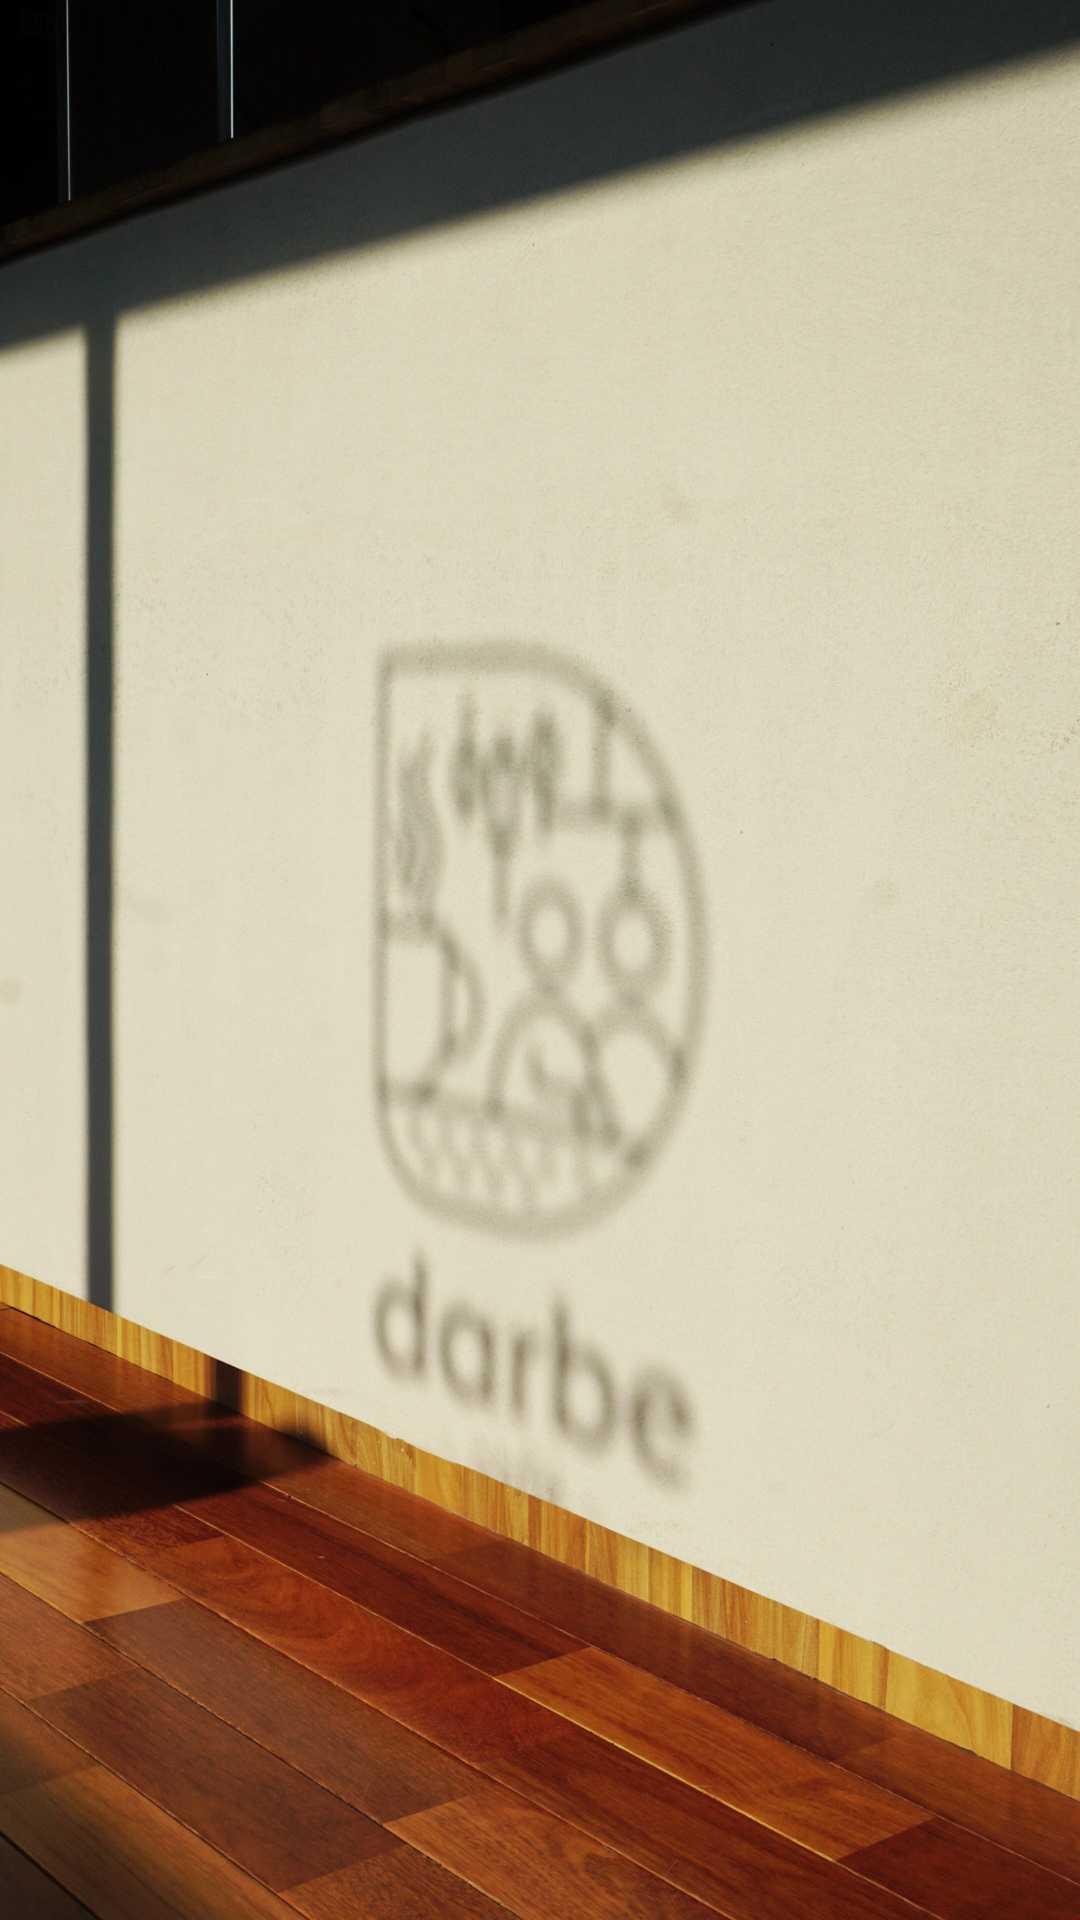 Sekala Darbe Cafe & Office, Surabaya Surabaya, Kota Sby, Jawa Timur, Indonesia Surabaya, Kota Sby, Jawa Timur, Indonesia Sekala-Drabe-Cafe-Office  97788